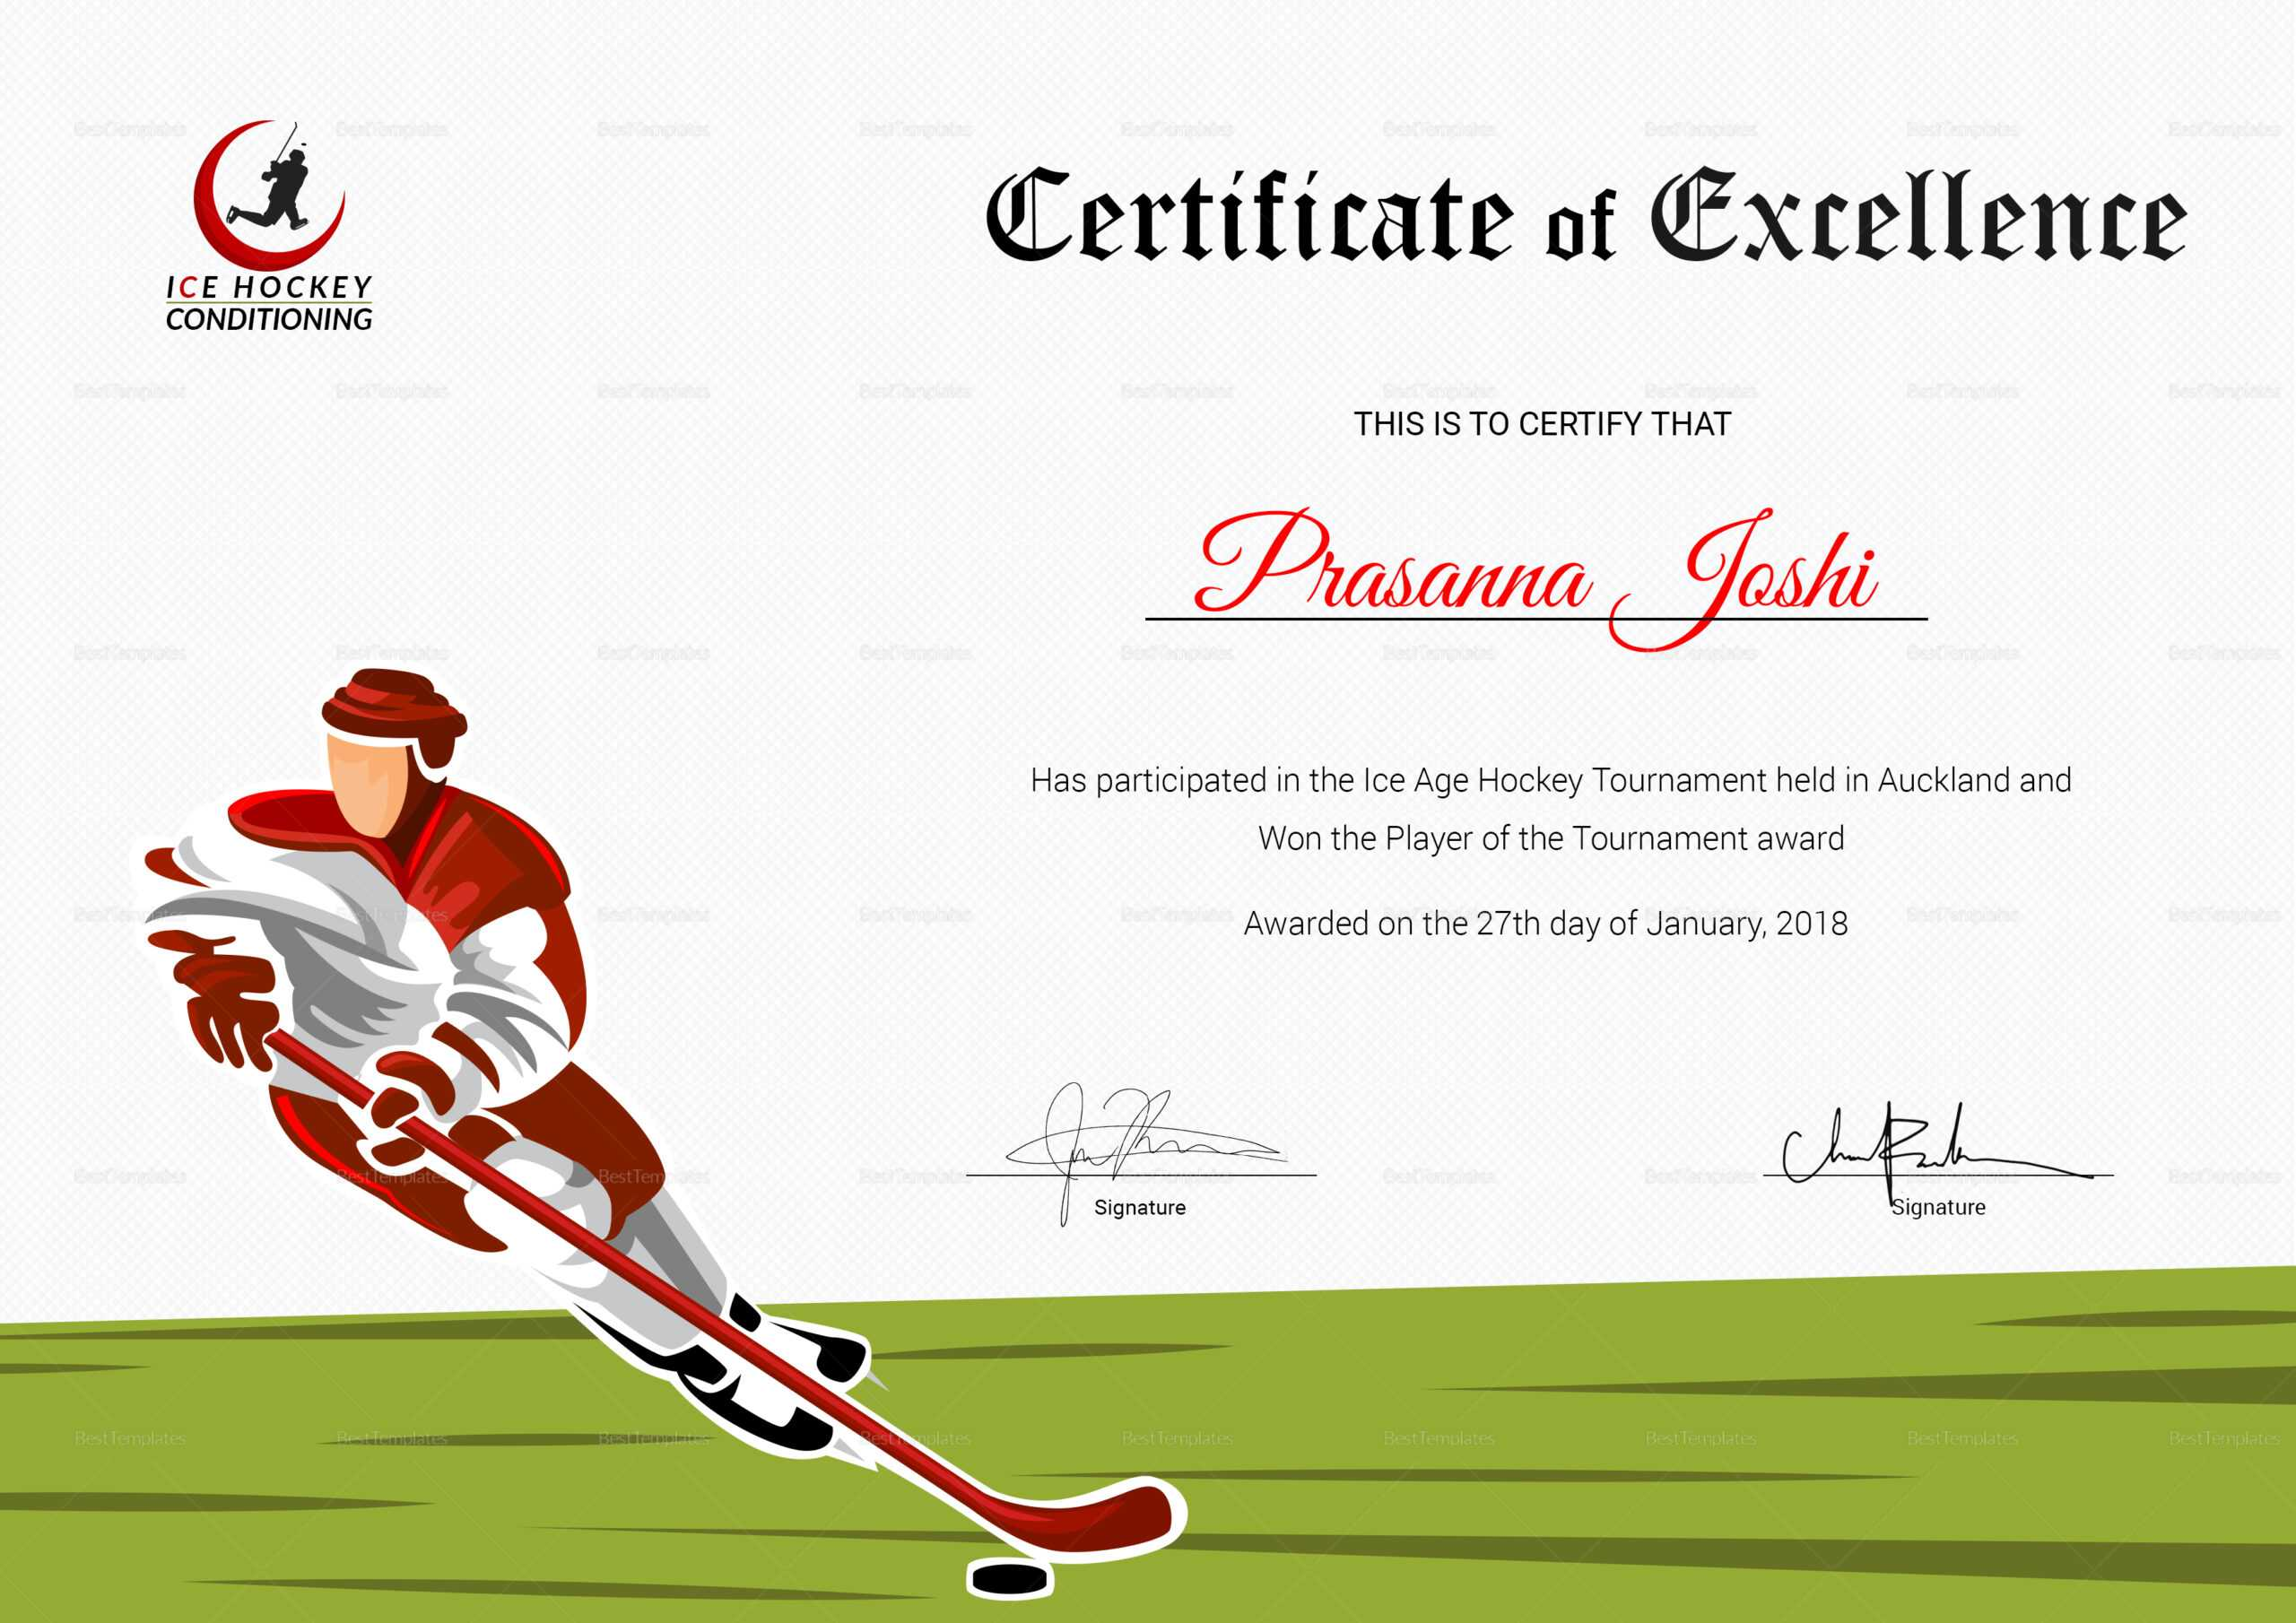 hockey certificate templates template performance psd douglasbaseball award professional word vancecountyfair